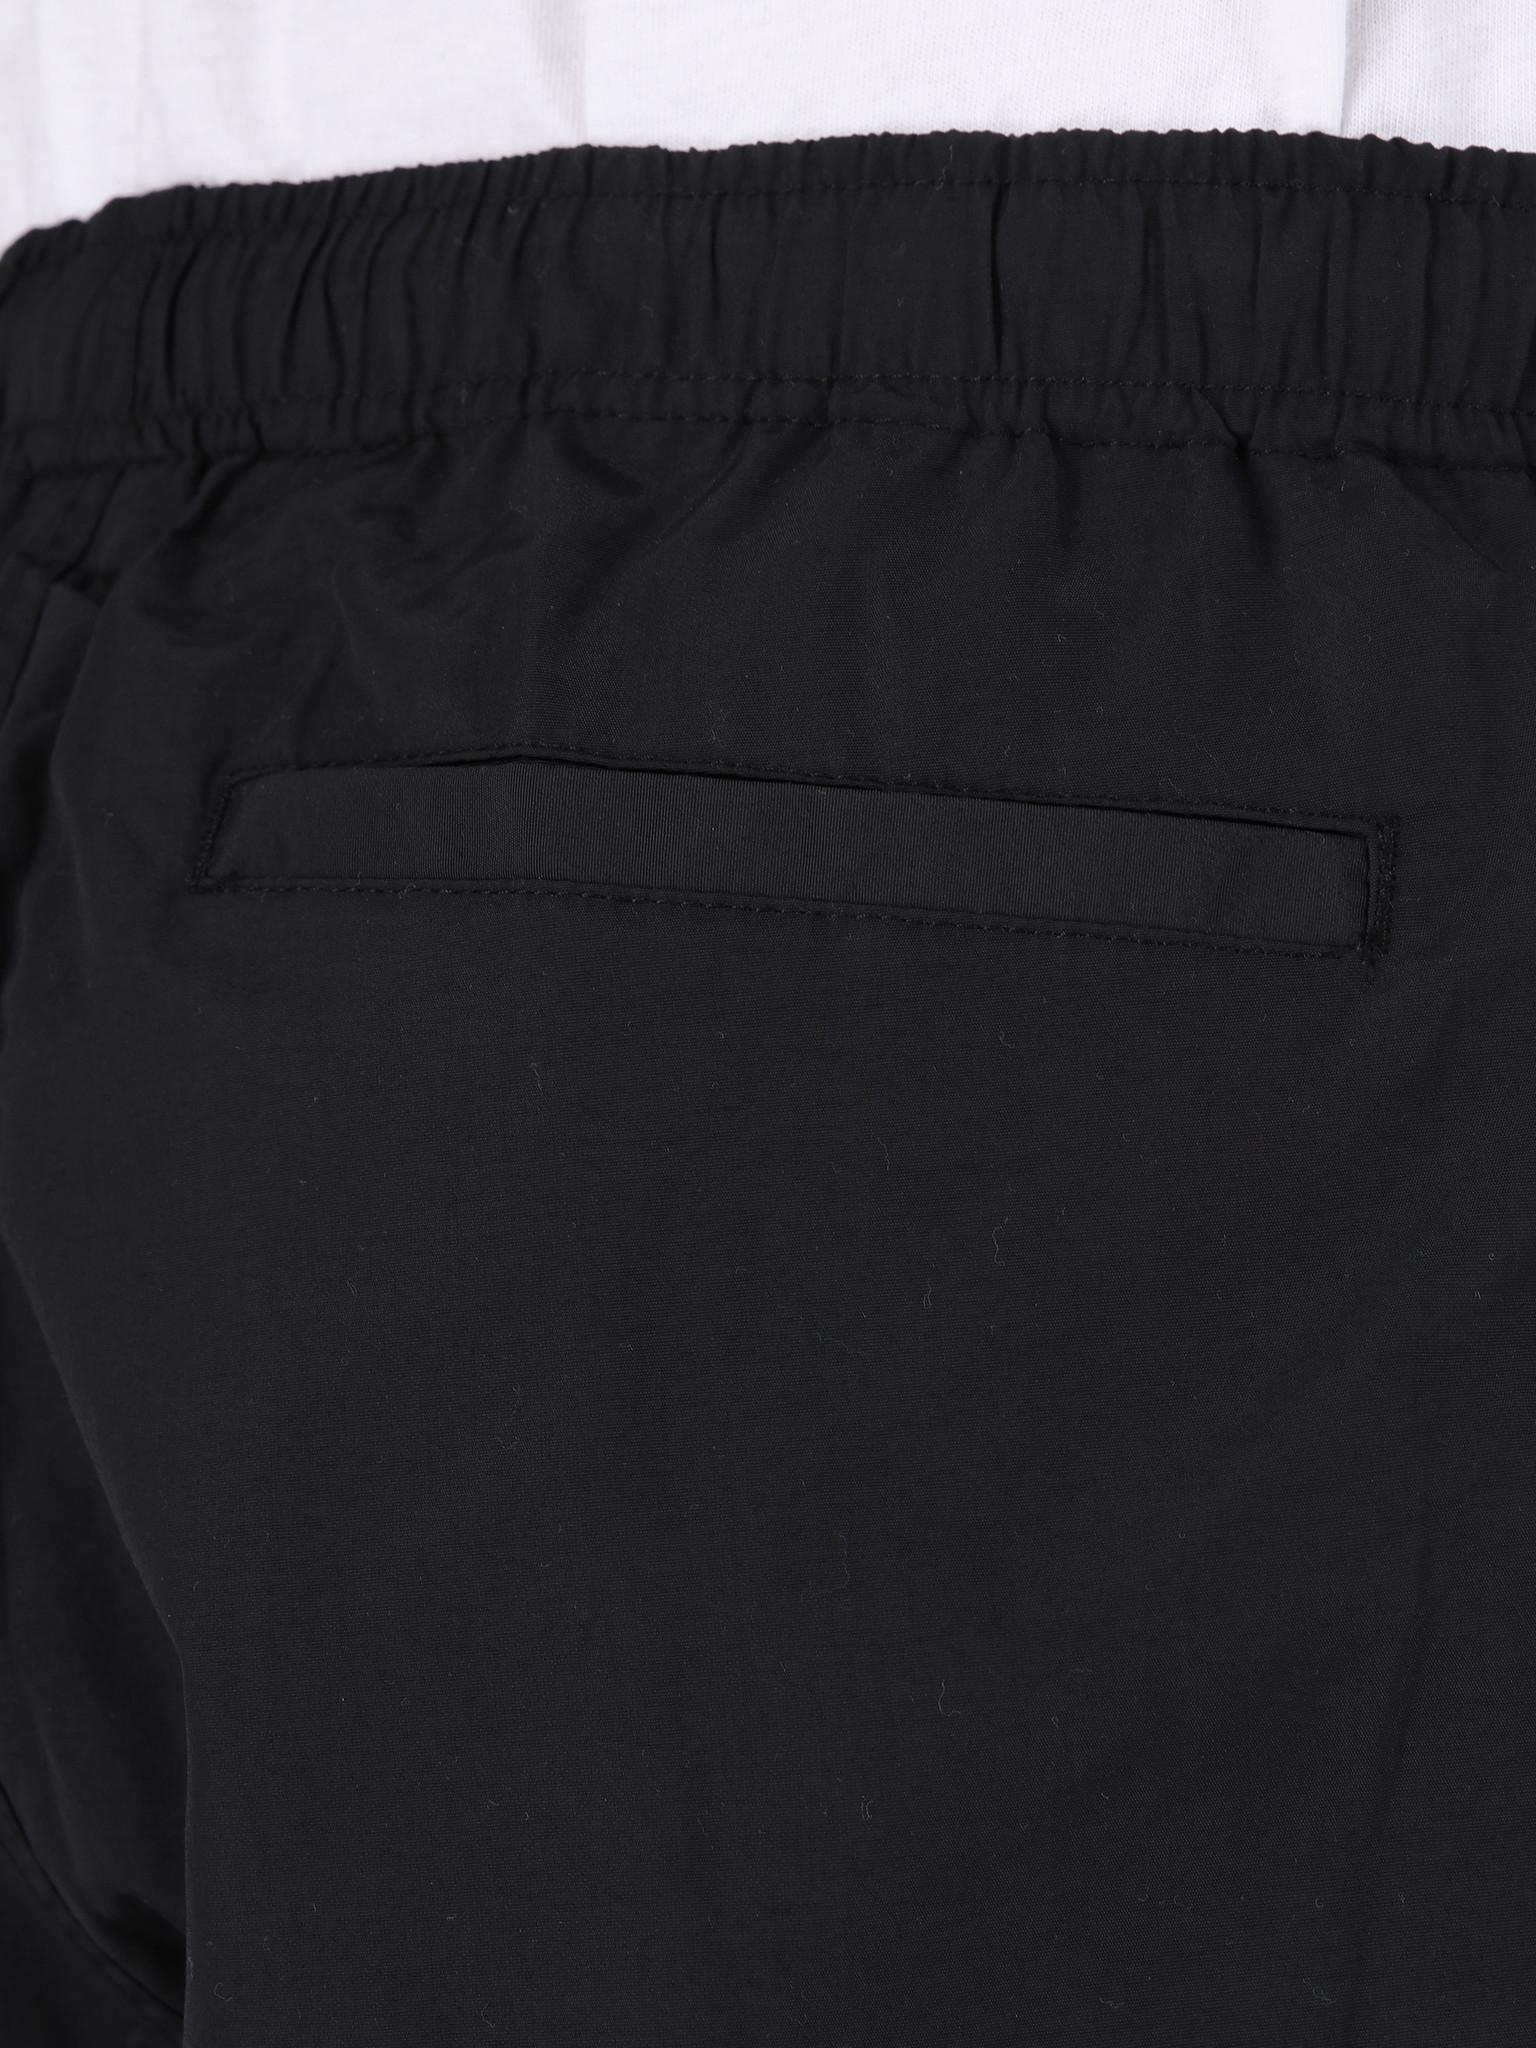 Obey Obey Outlander Pant BLK 142020134